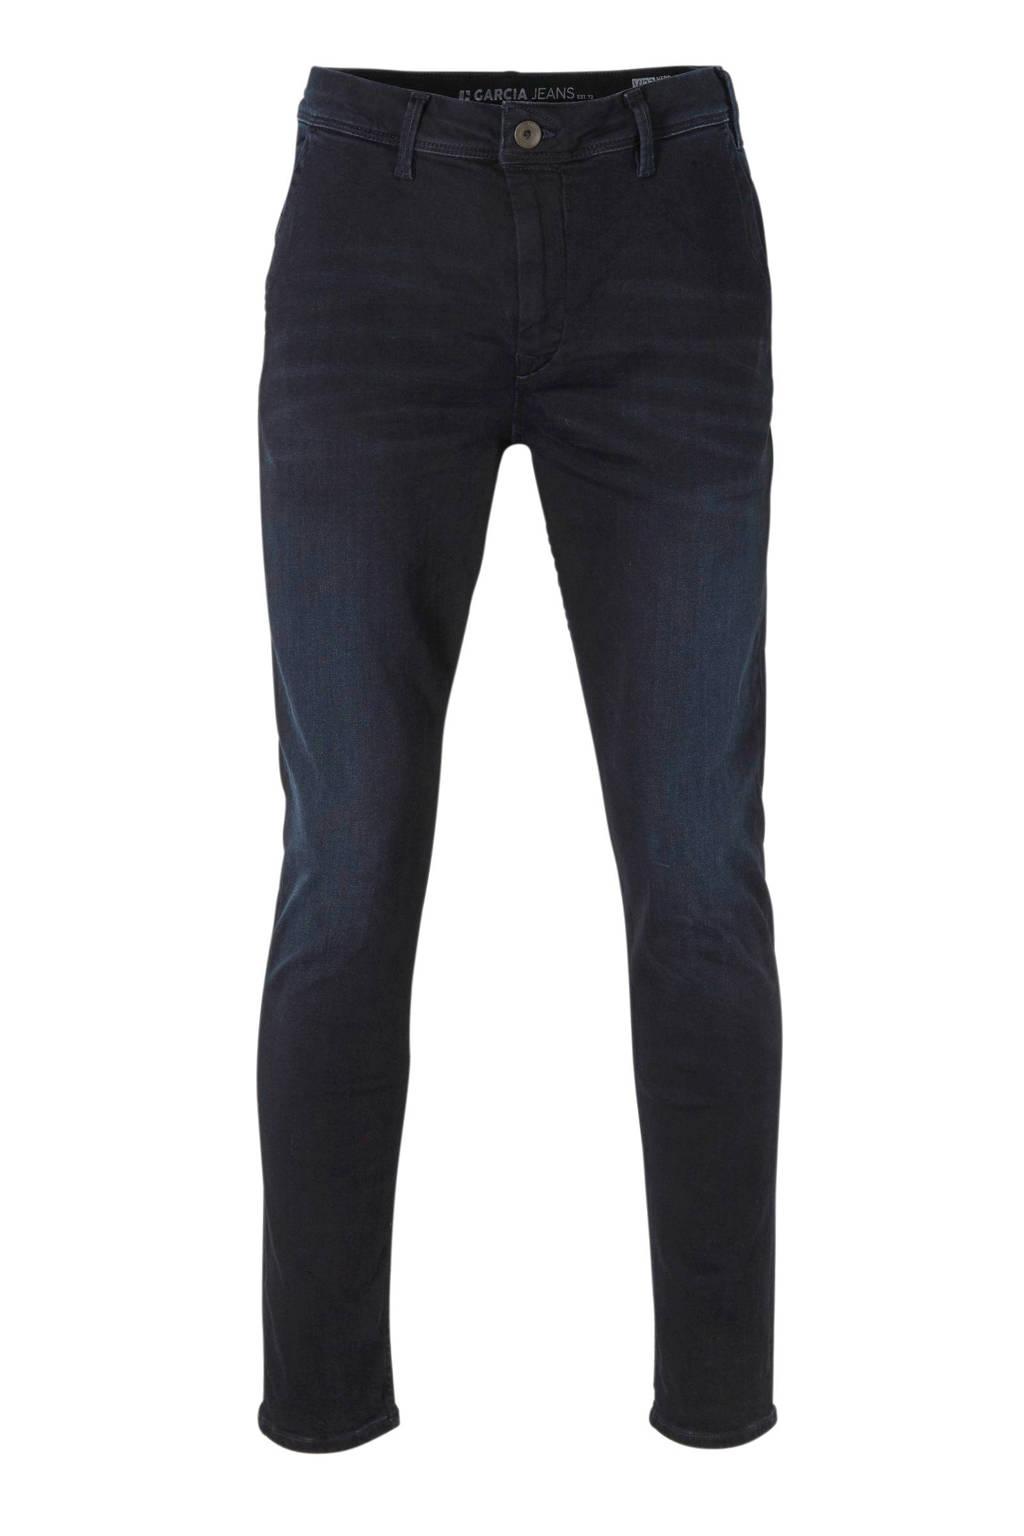 Garcia slim fit jeans Nero, 8247-dark used